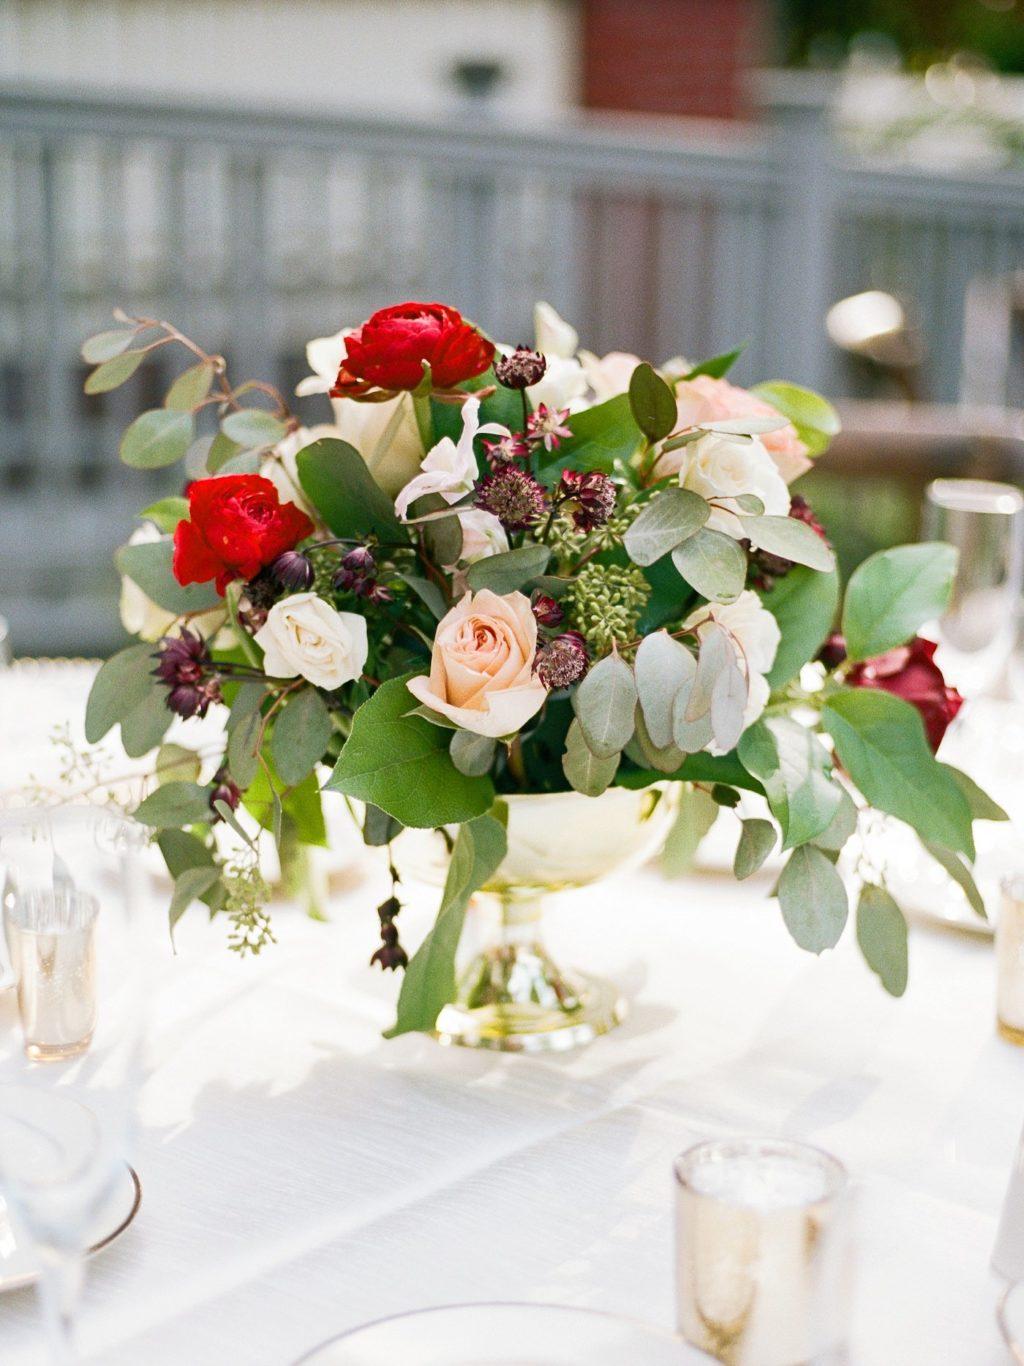 Low Wedding Centerpiece Floral Arrangement of Eucalyptus Greenery, Cream Roses, Red Renunculus, and Bordeaux Chrysanthemums in Gold Pedestal Vase   Tampa Wedding Florist Brides N Blooms